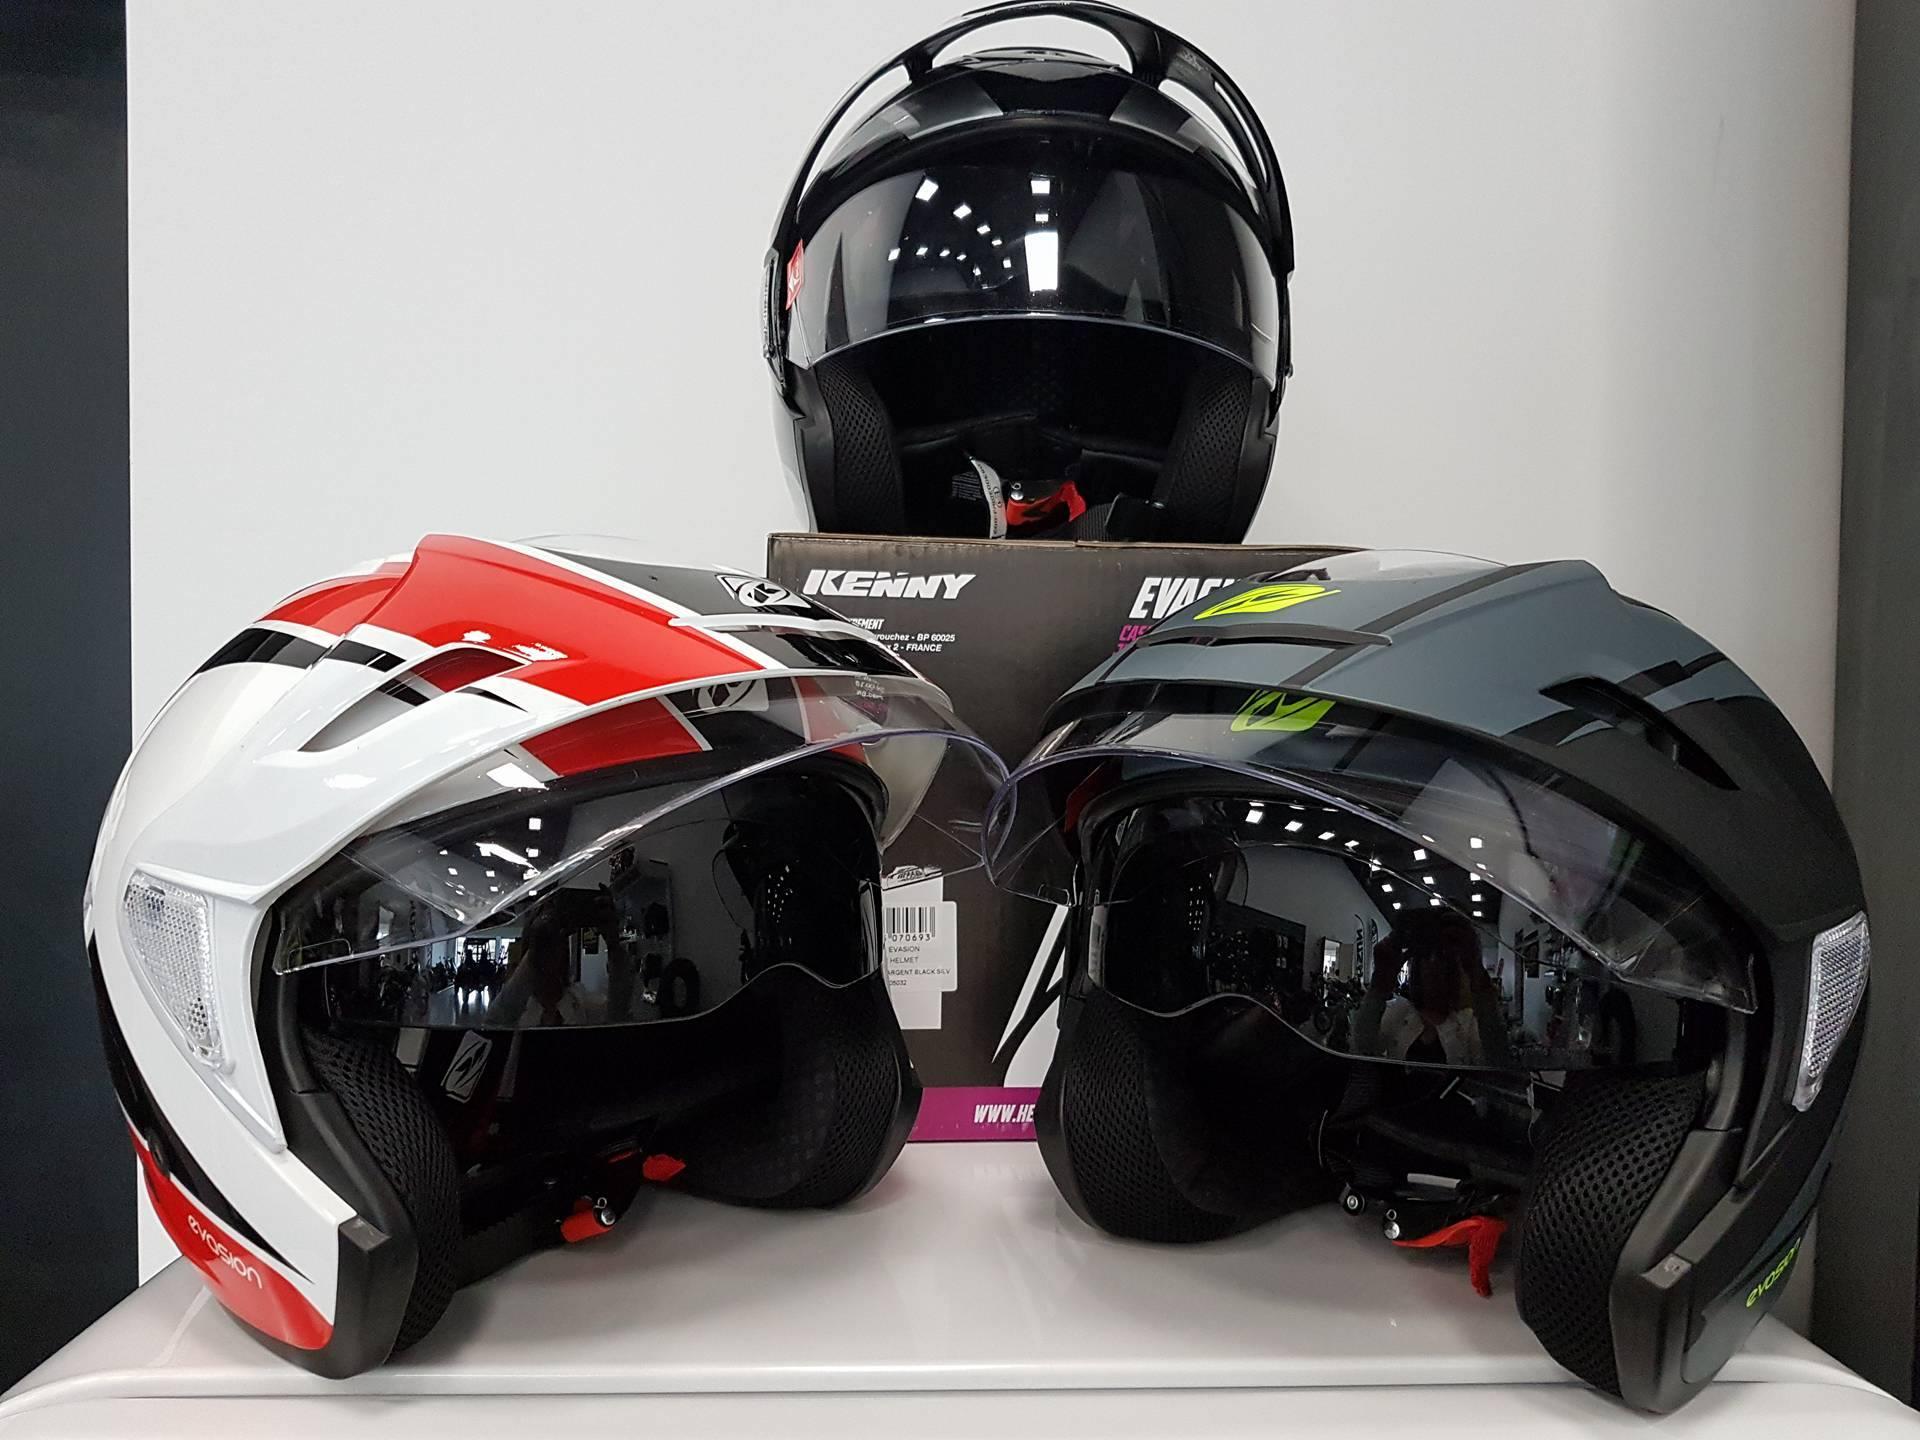 Casque de moto homologué